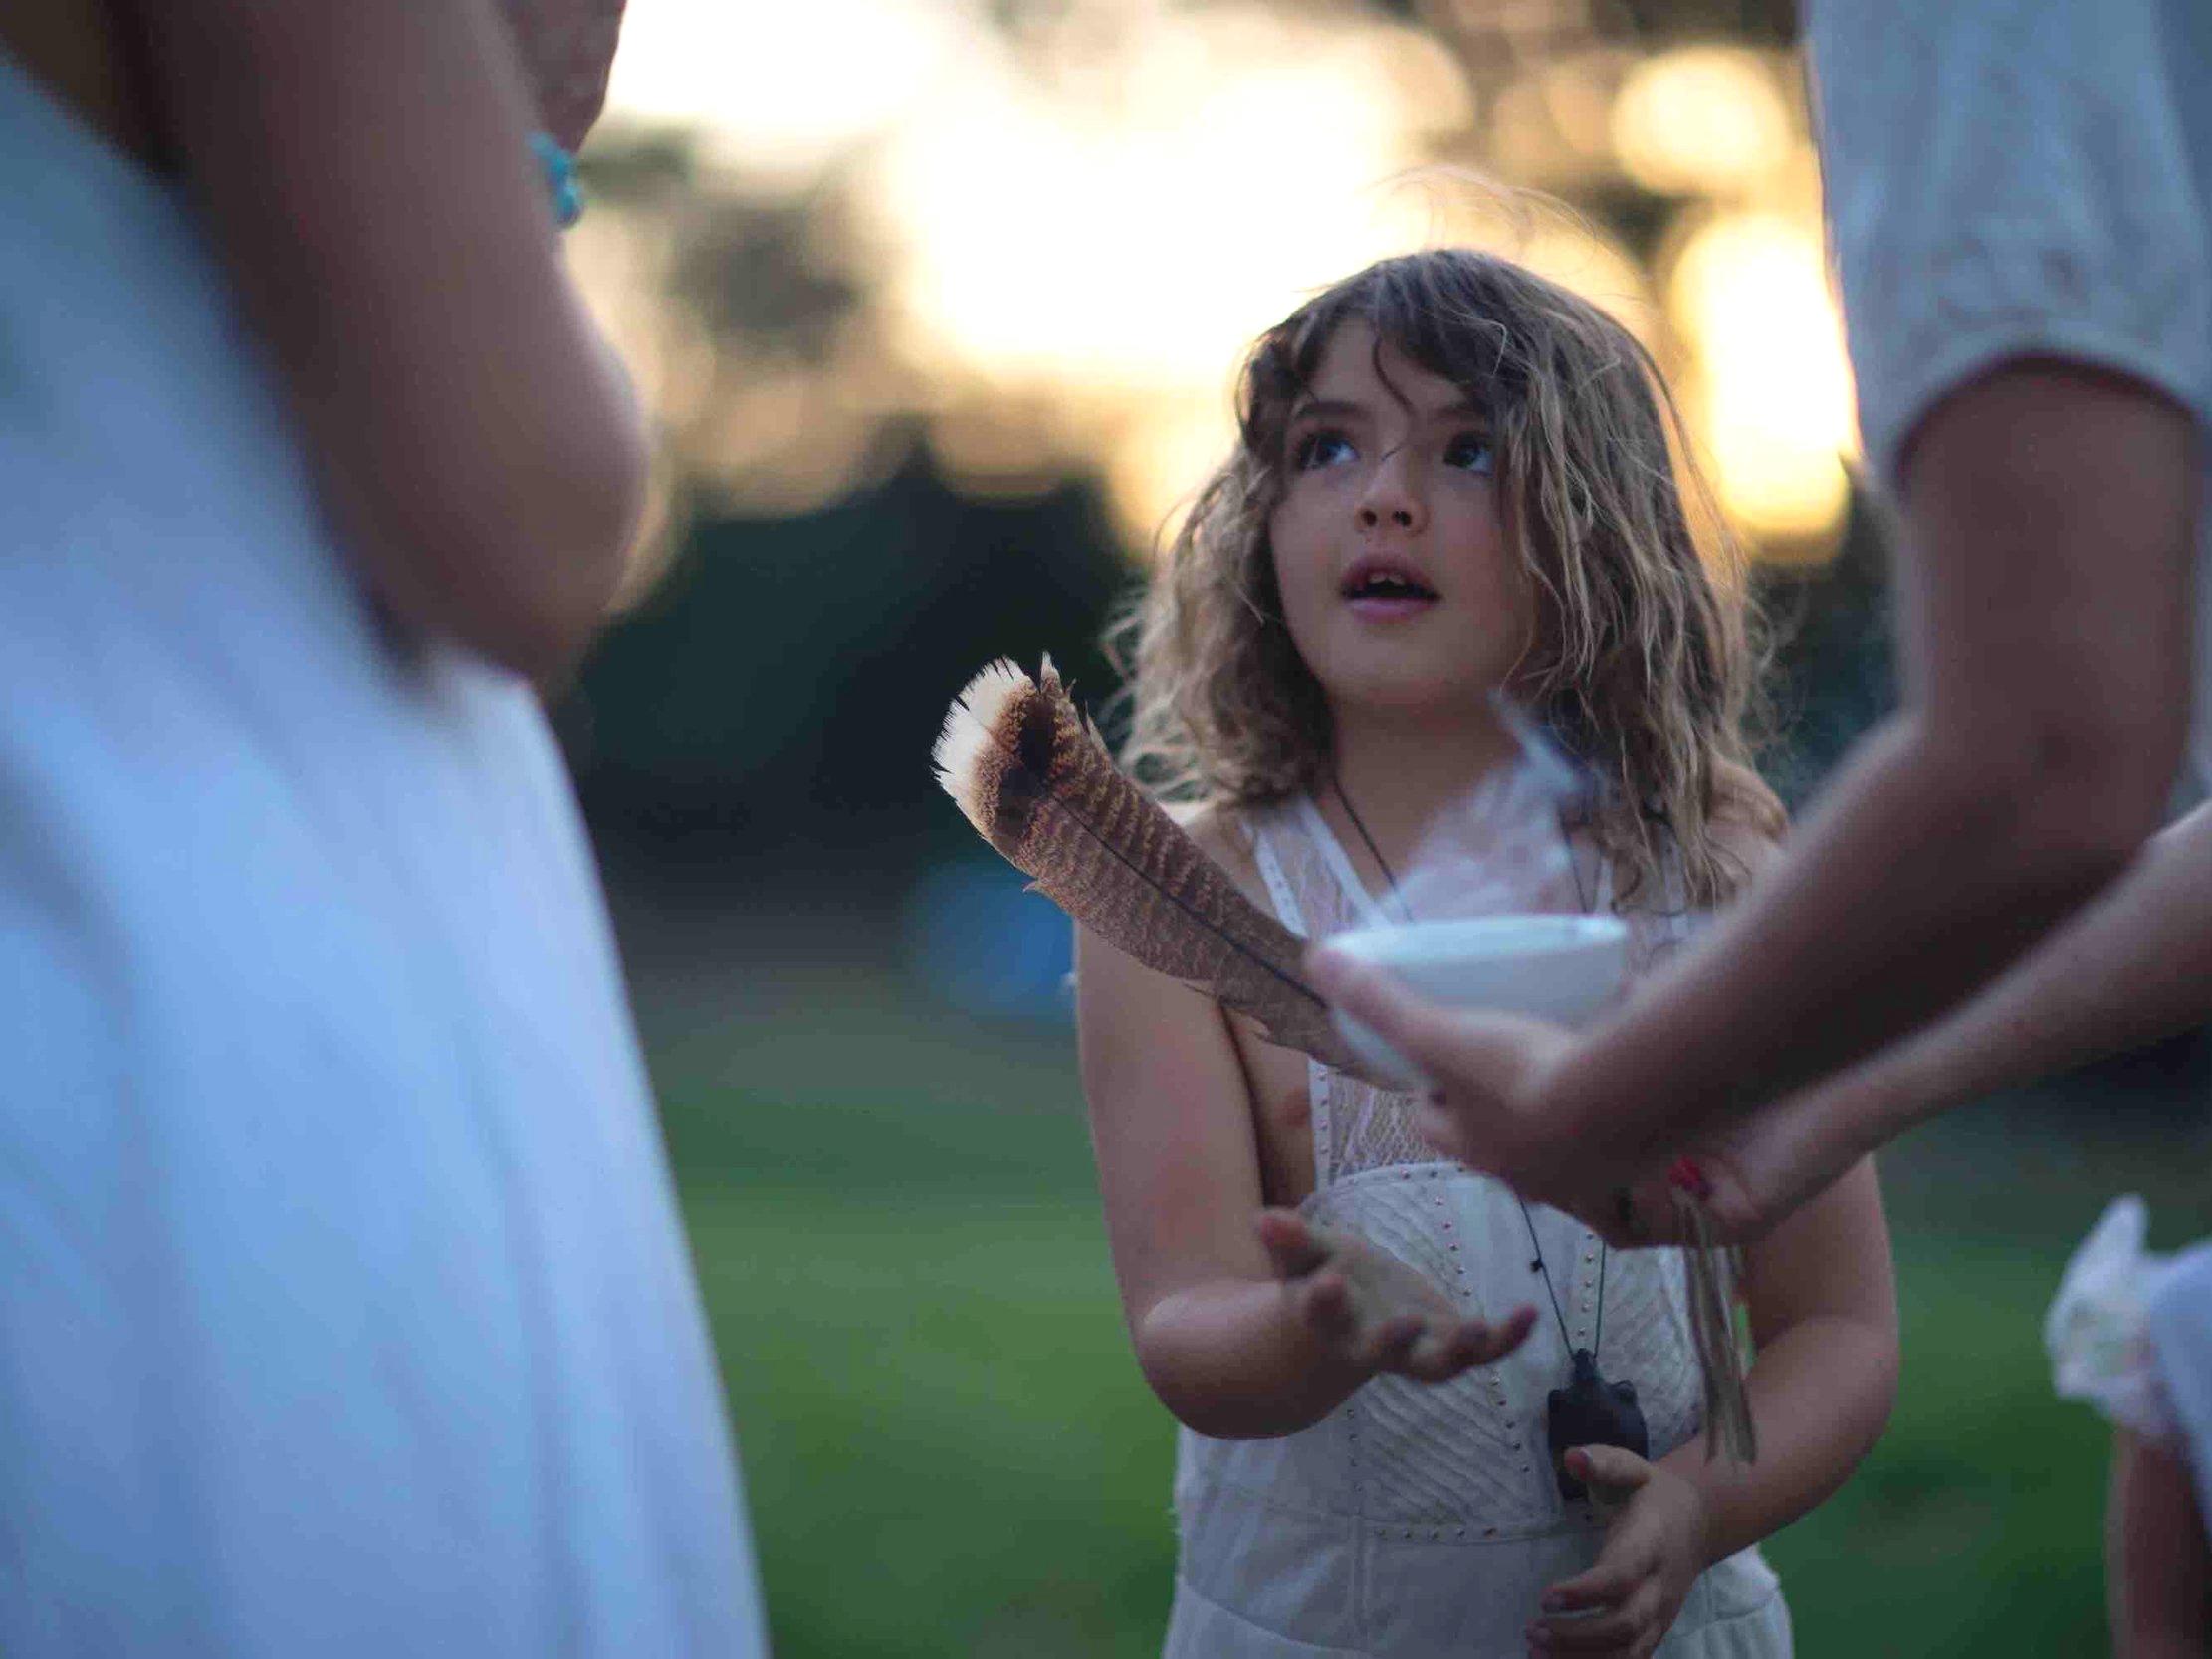 Arcoora_Child_Feather_Dancing+_Freedom_LR.jpg